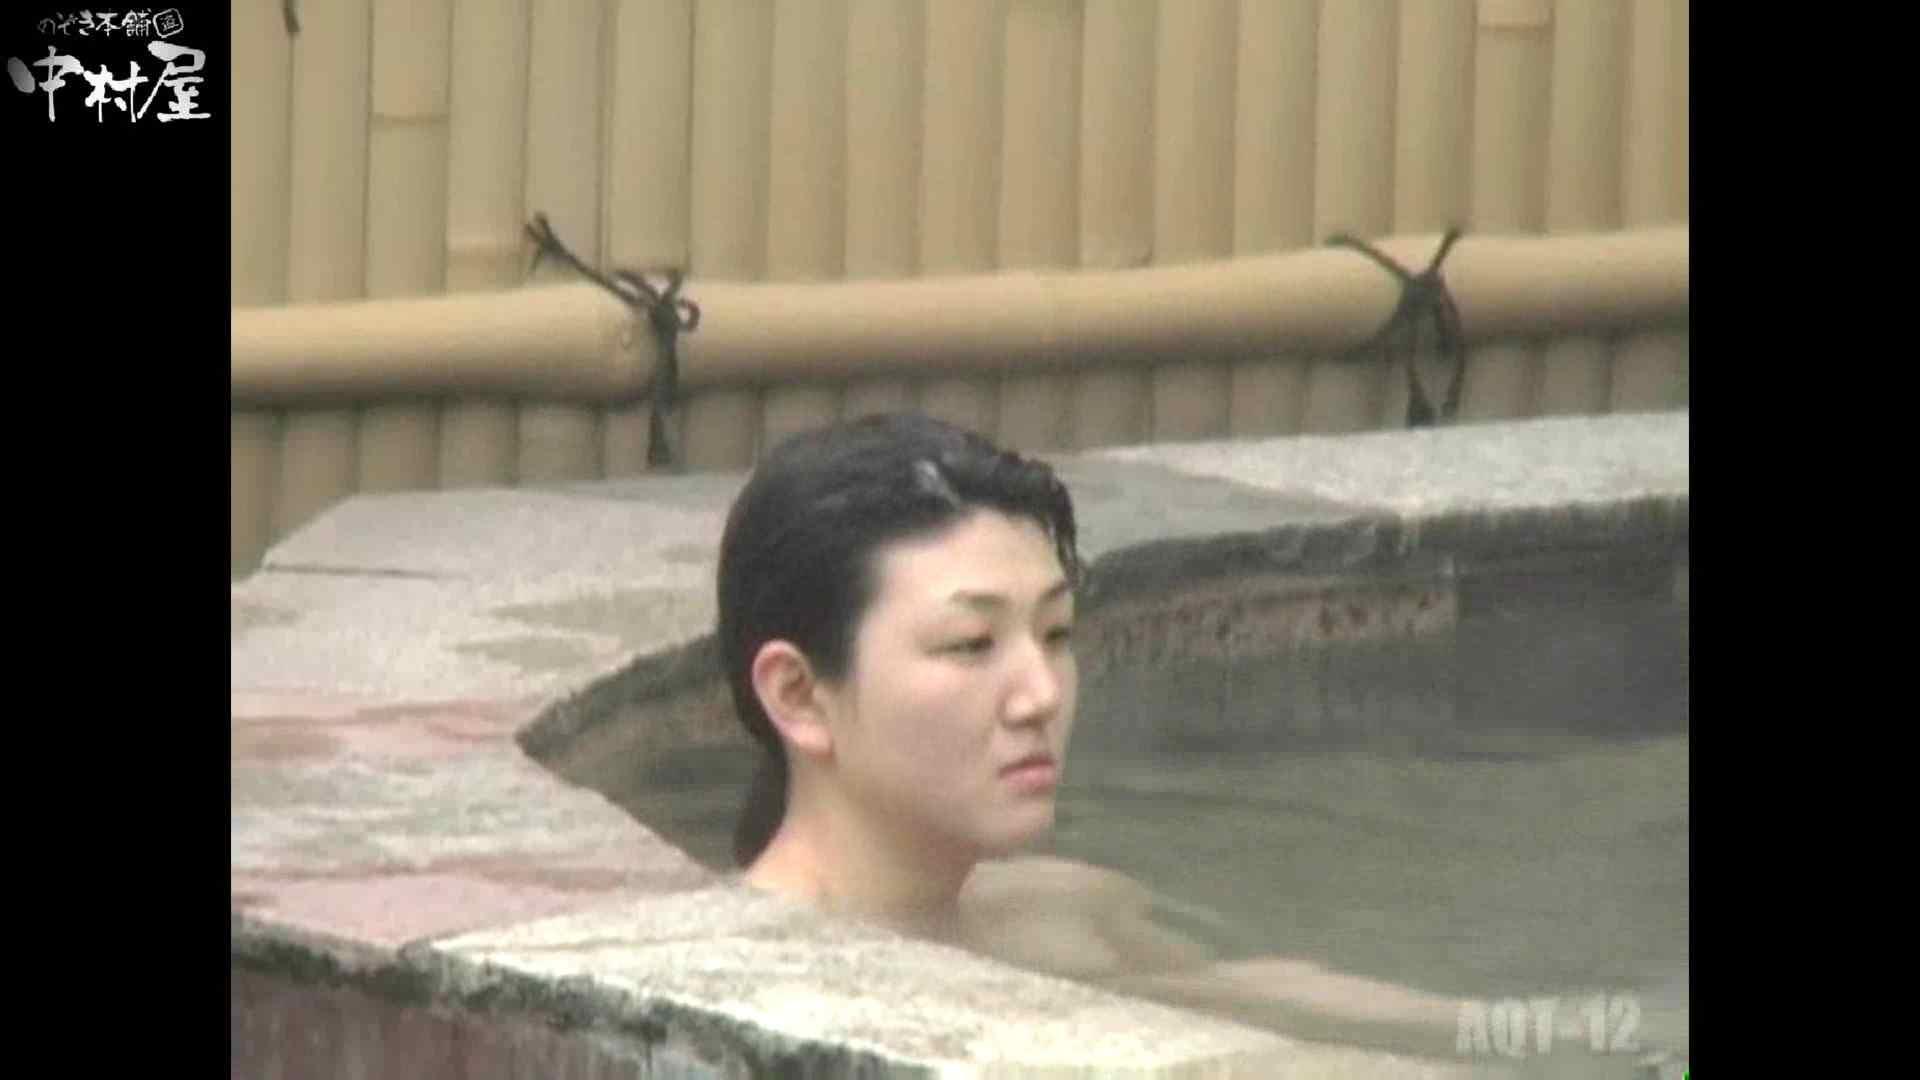 Aquaな露天風呂Vol.876潜入盗撮露天風呂十二判湯 其の六 美しいOLの裸体 AV無料動画キャプチャ 107pic 42